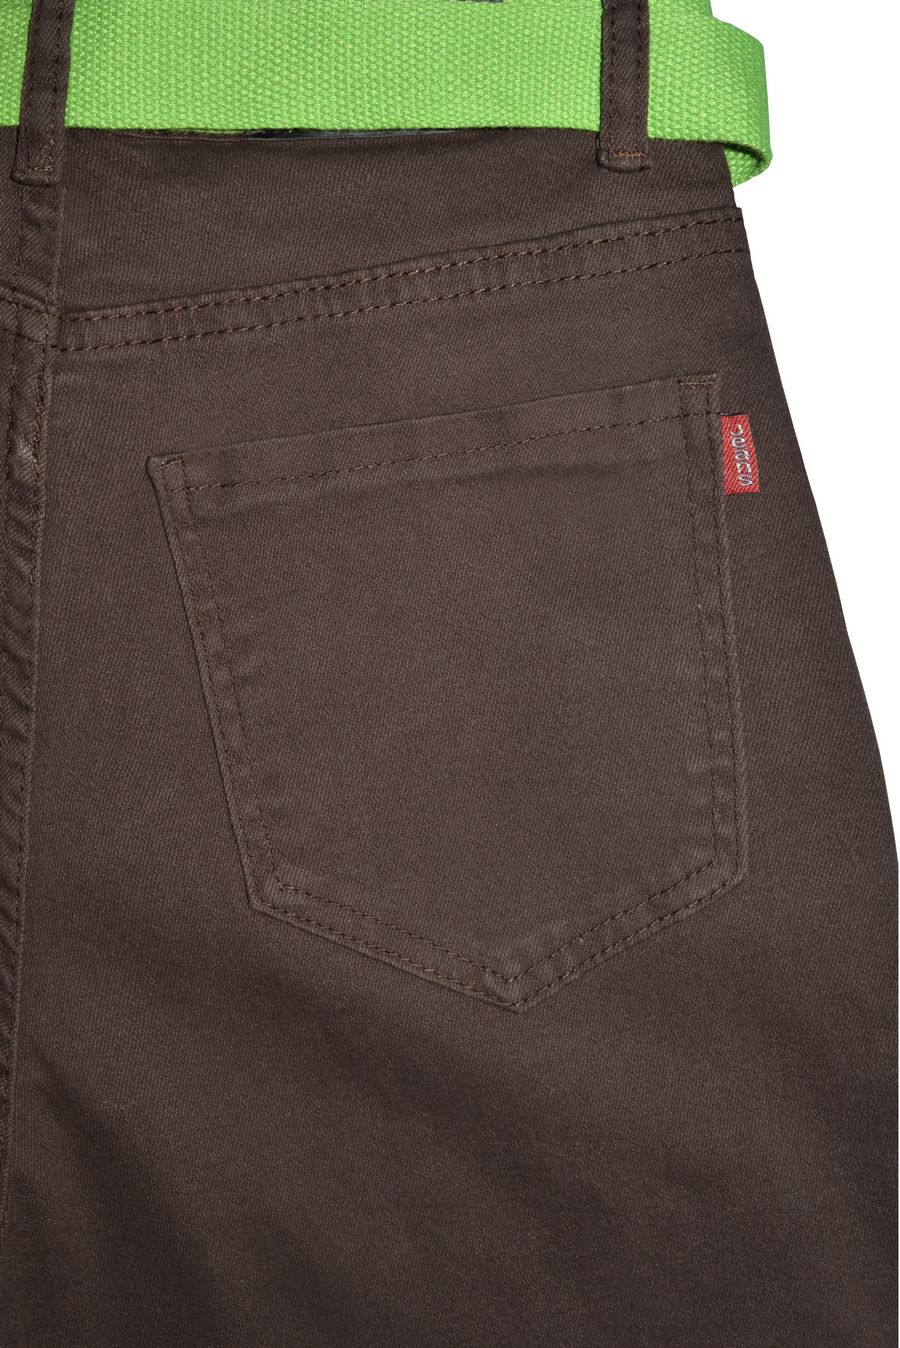 Брюки женские K.Y Jeans 5707 - фото 4